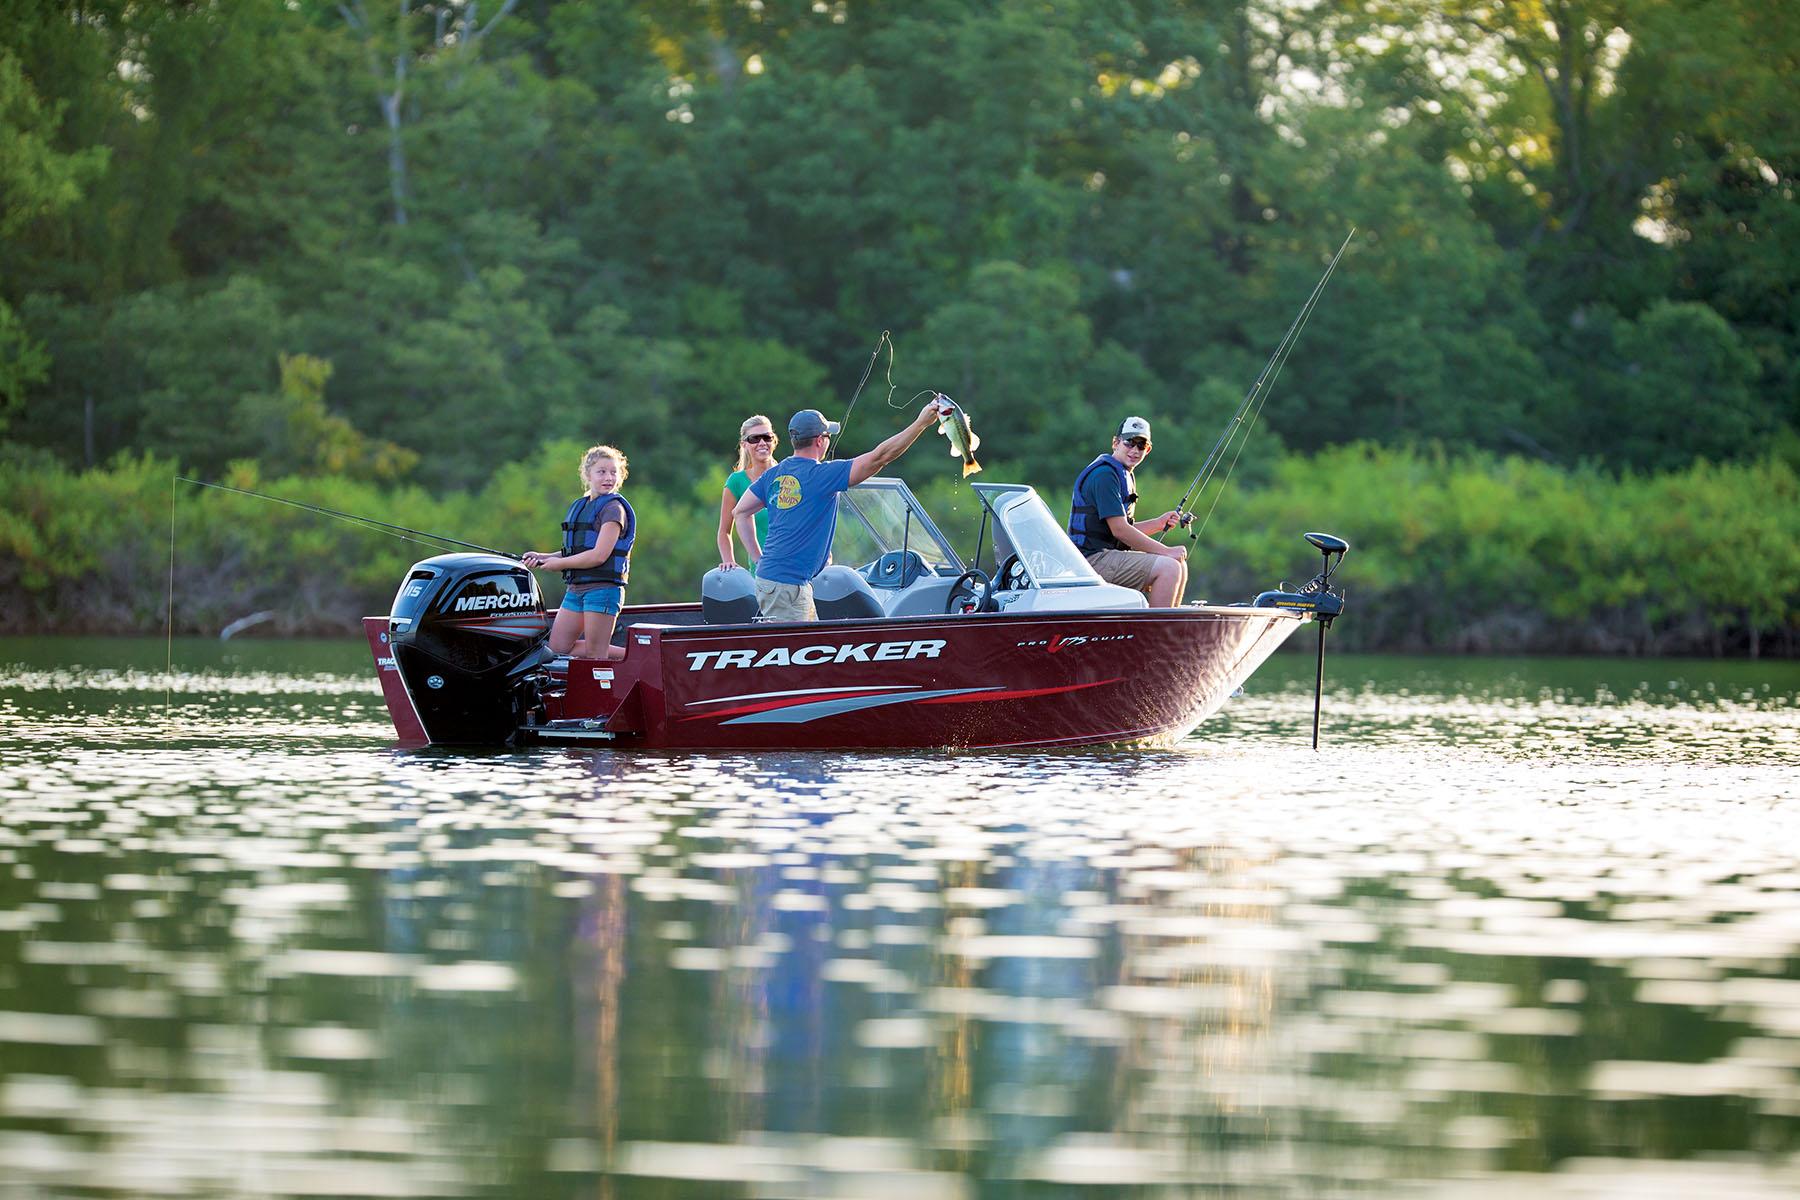 5-Year, full-coverage warranty for Tracker aluminum fishing boats